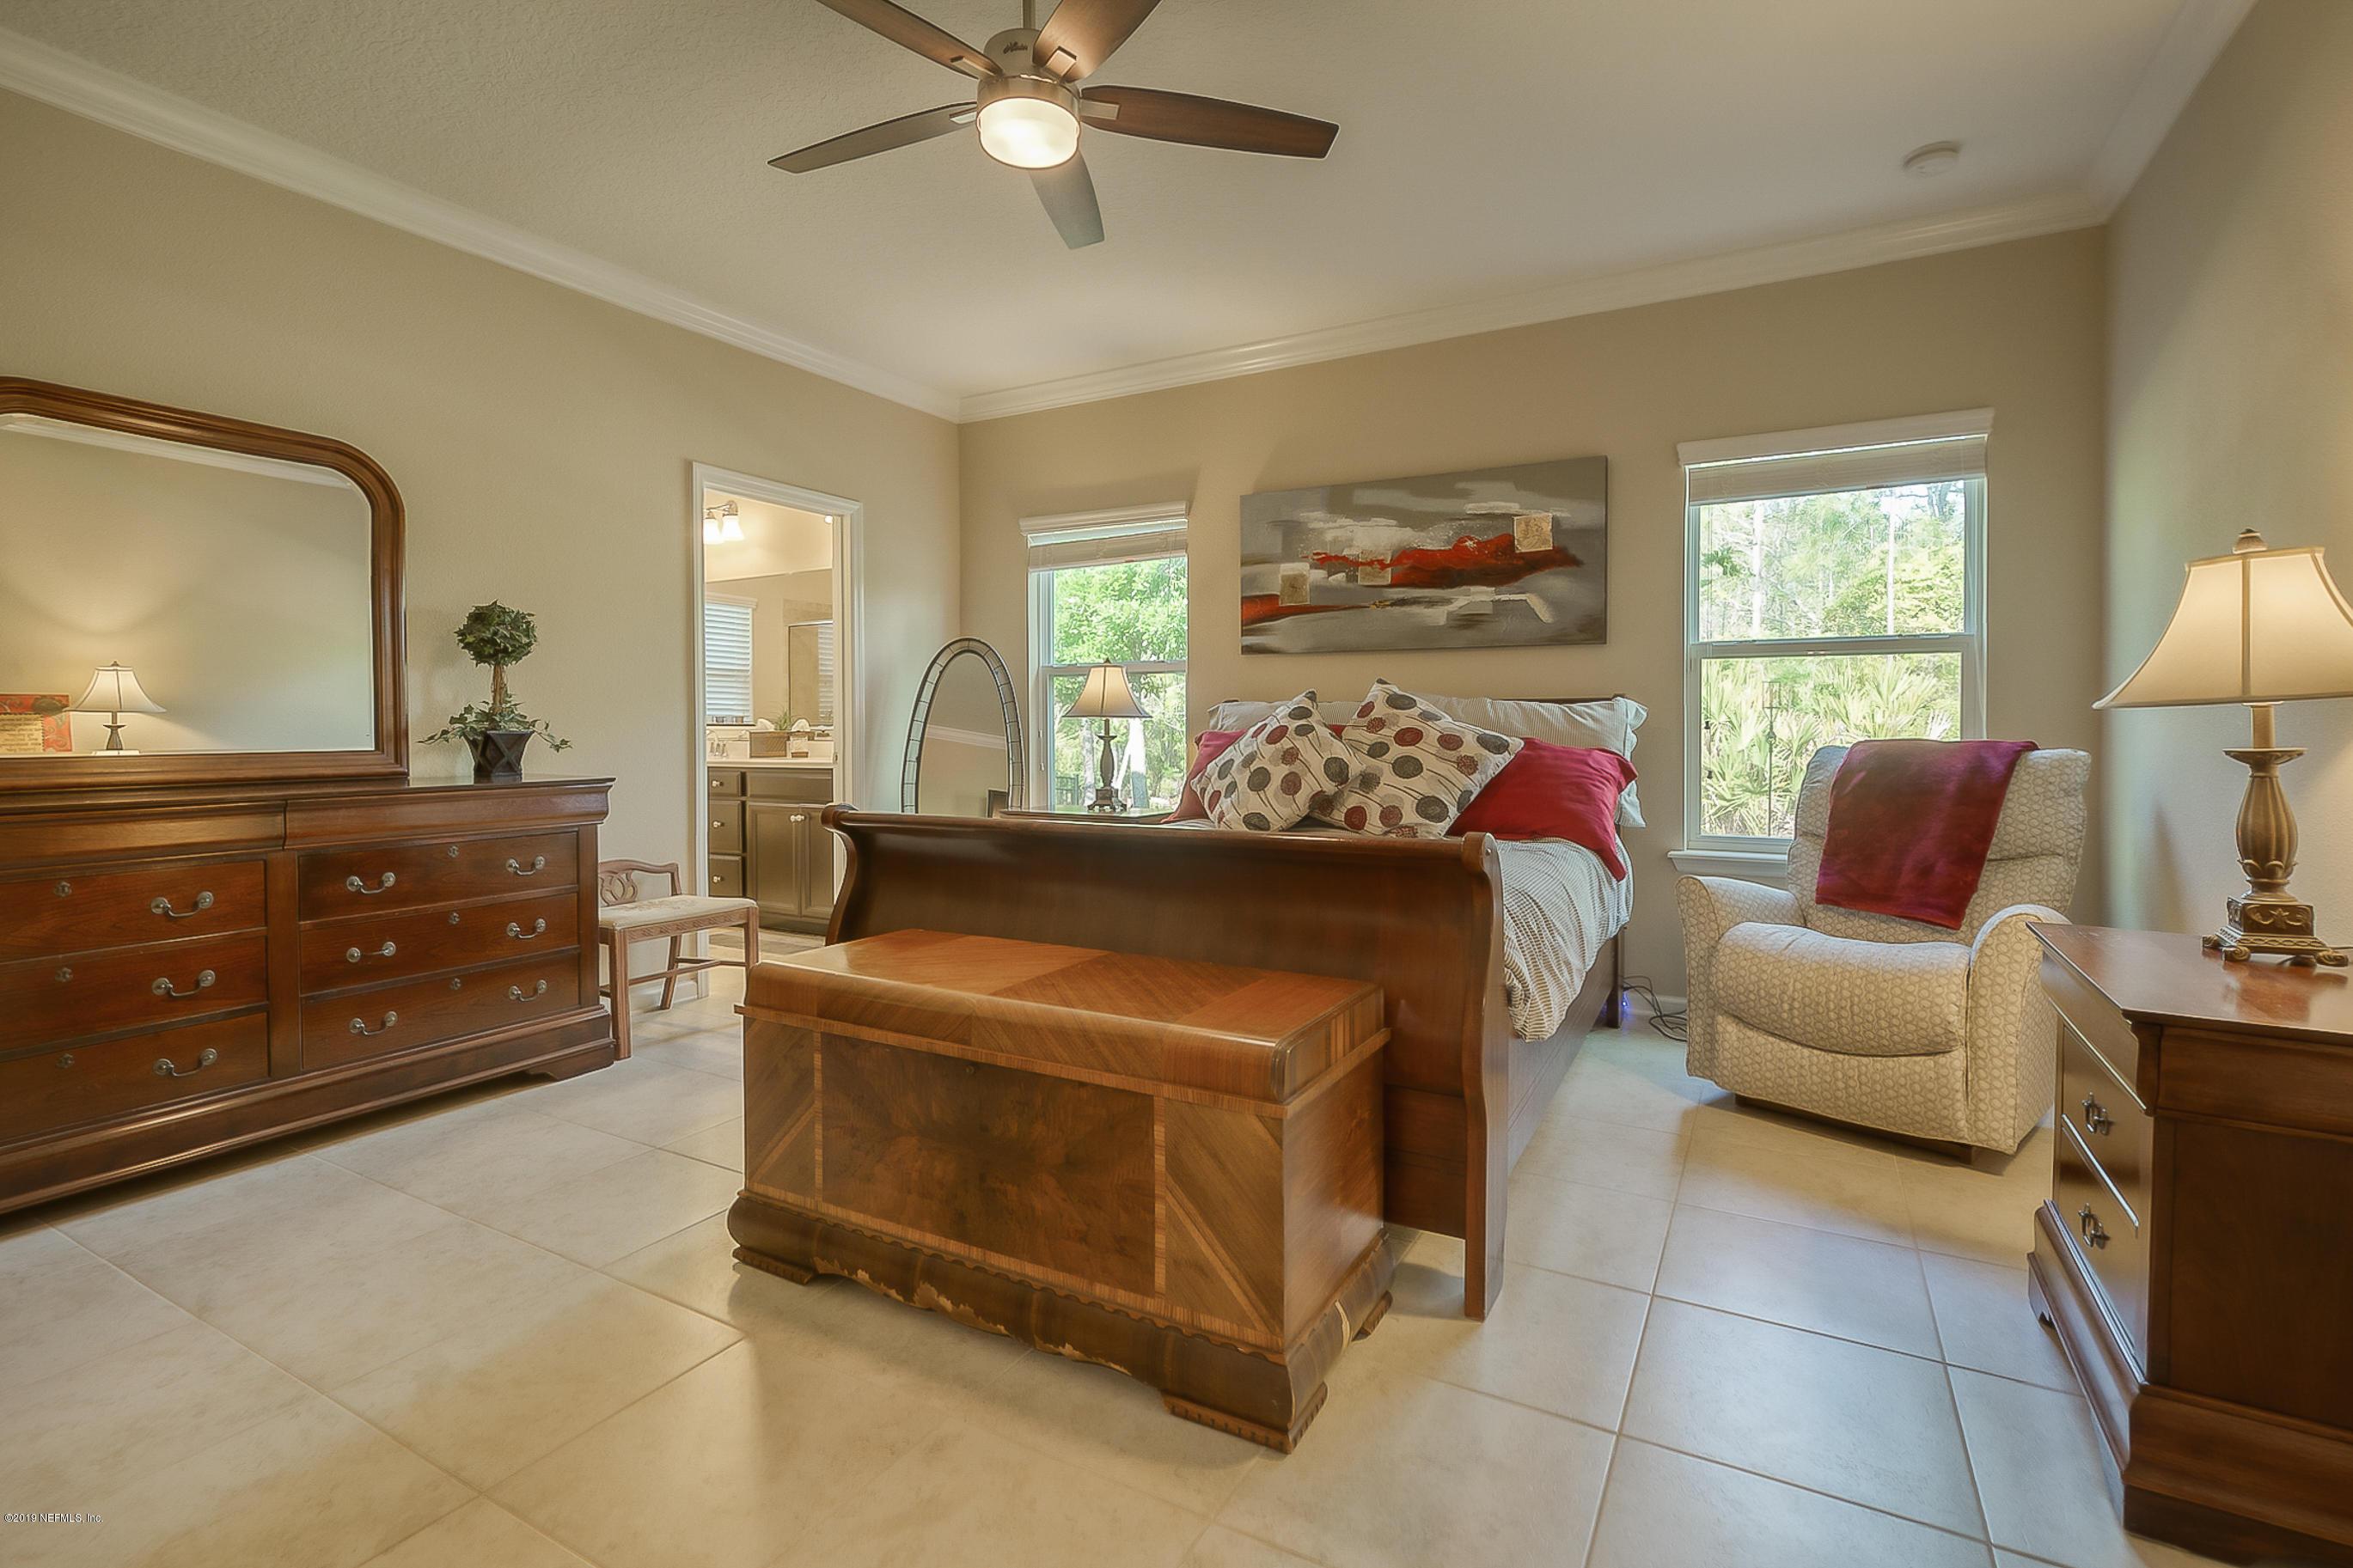 2528 LAS CALINAS, ST AUGUSTINE, FLORIDA 32095, 4 Bedrooms Bedrooms, ,2 BathroomsBathrooms,Residential - single family,For sale,LAS CALINAS,988989